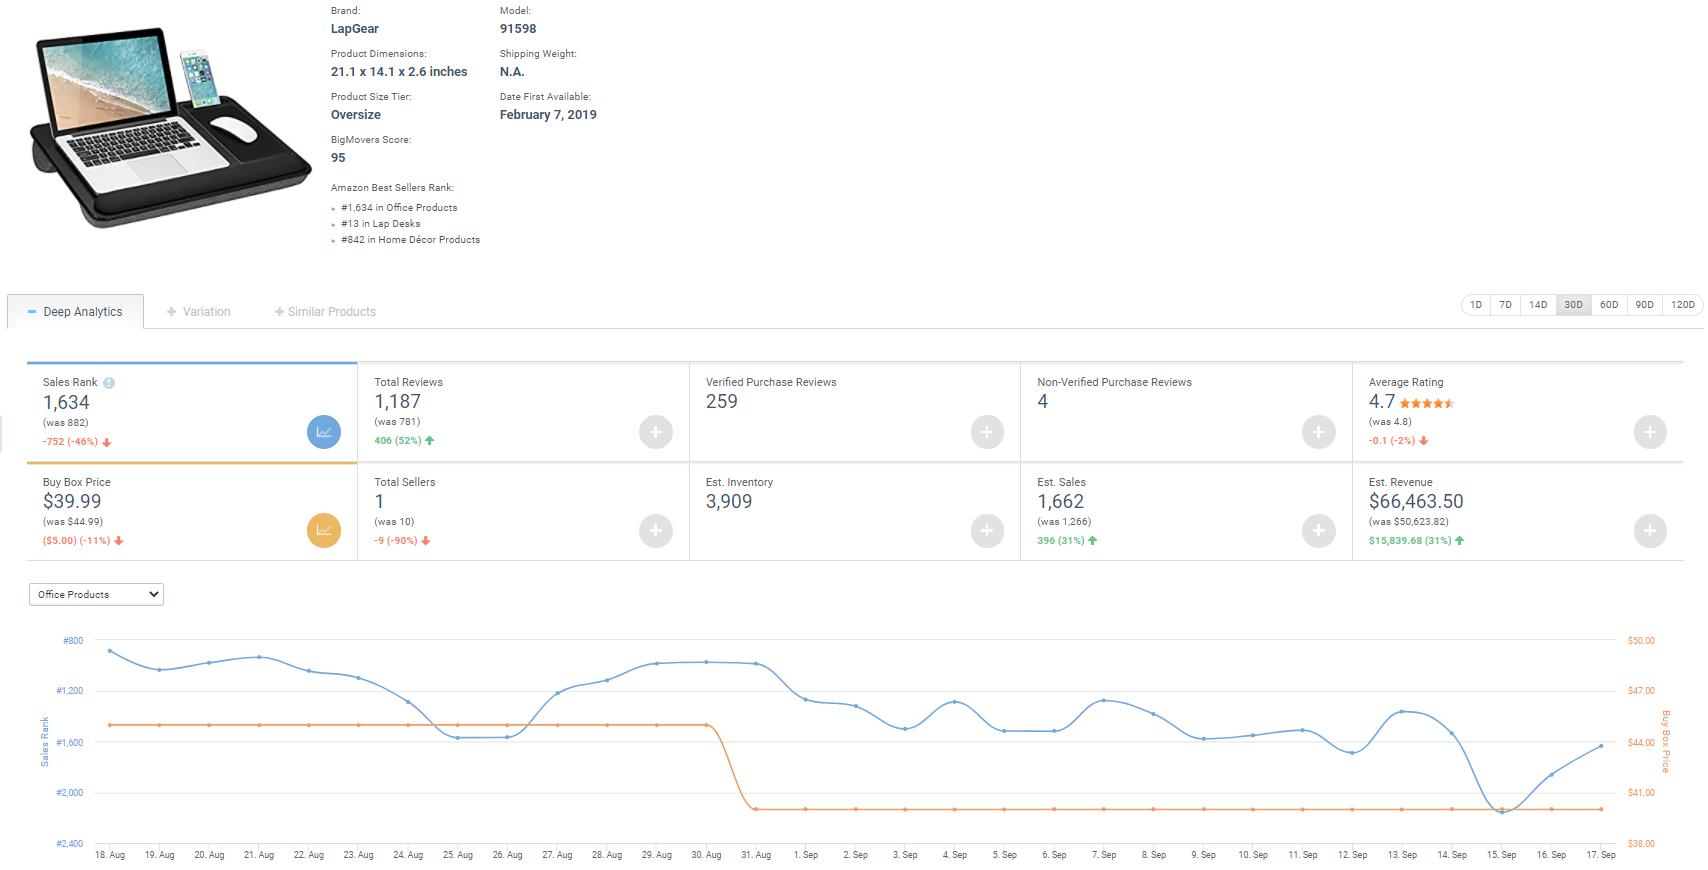 Product Tracker - Sales Analytics